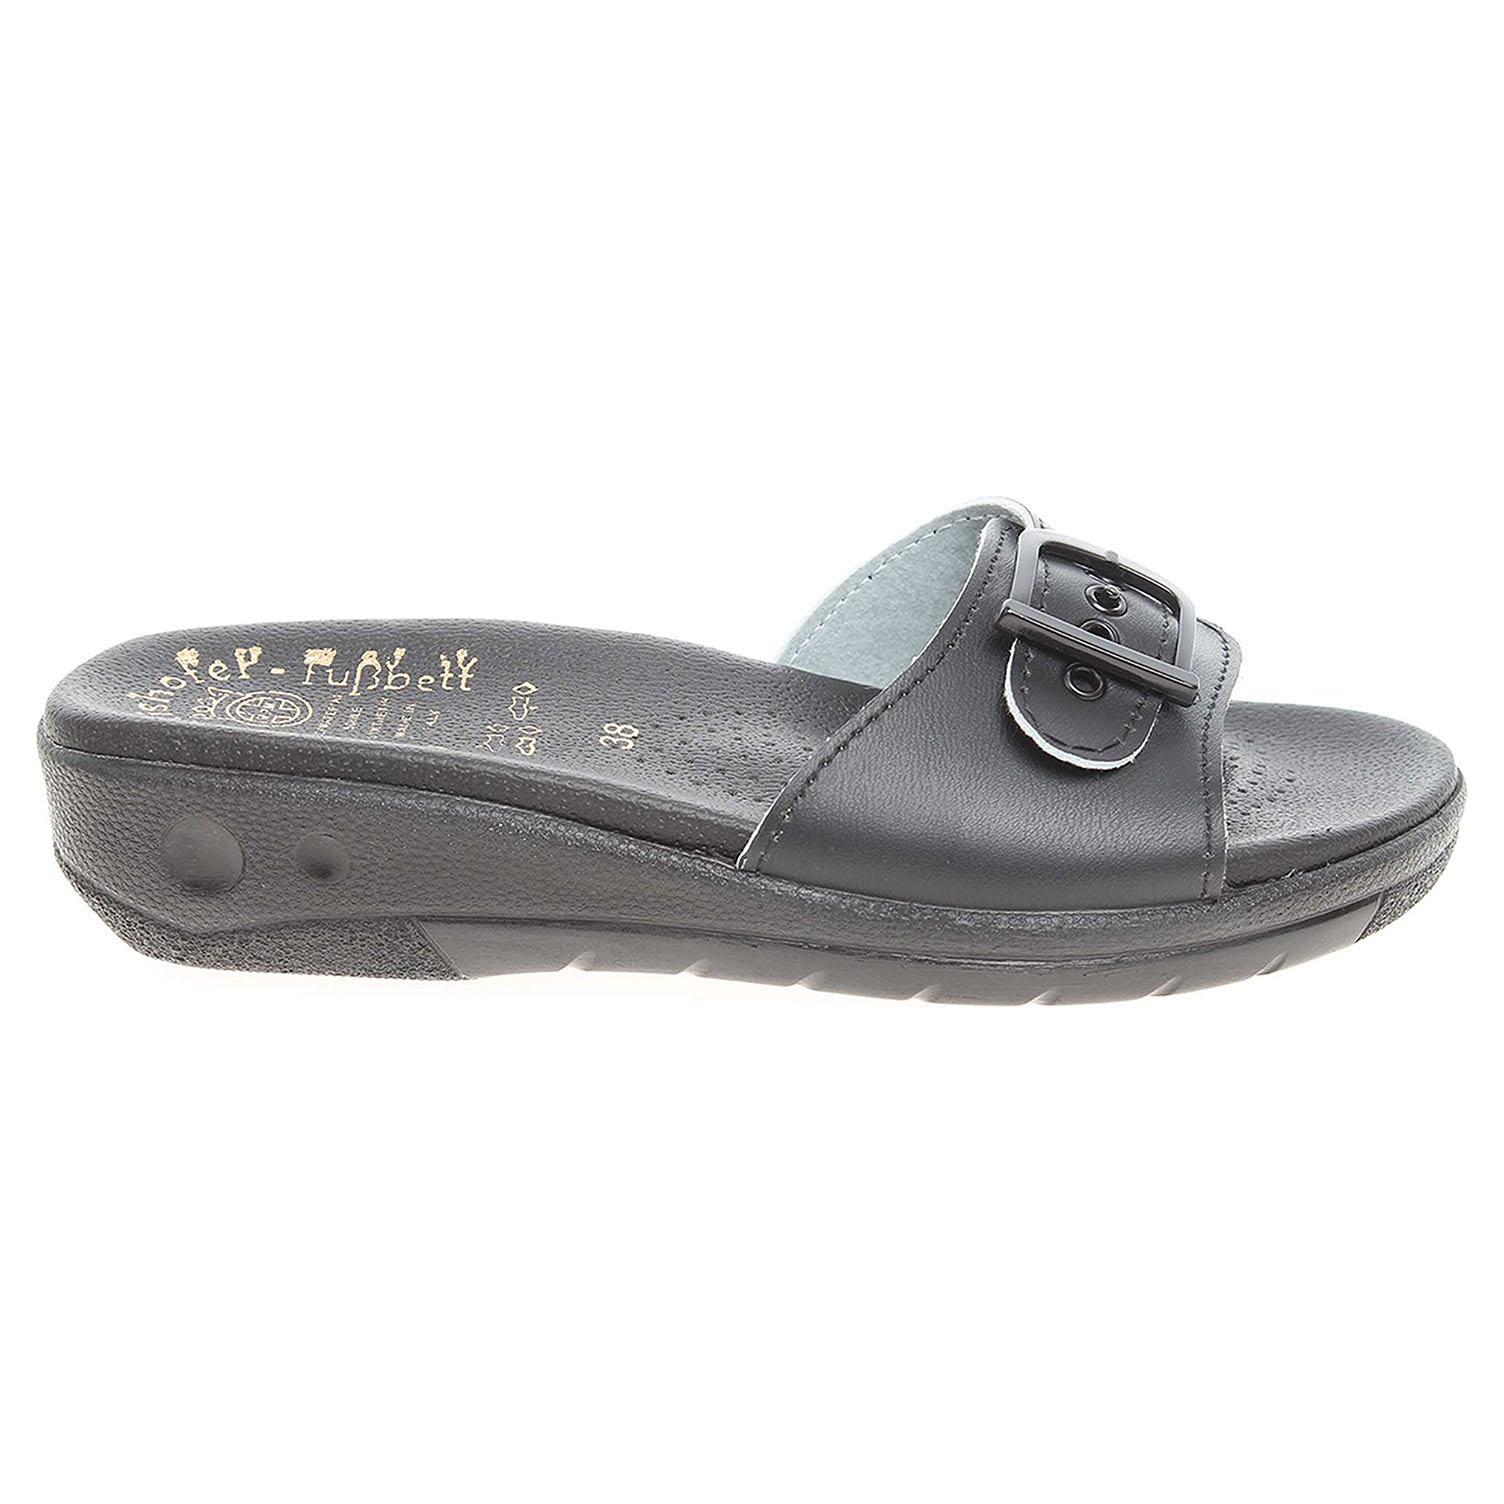 Ecco Dámské pantofle 5-20106 černé 23400306